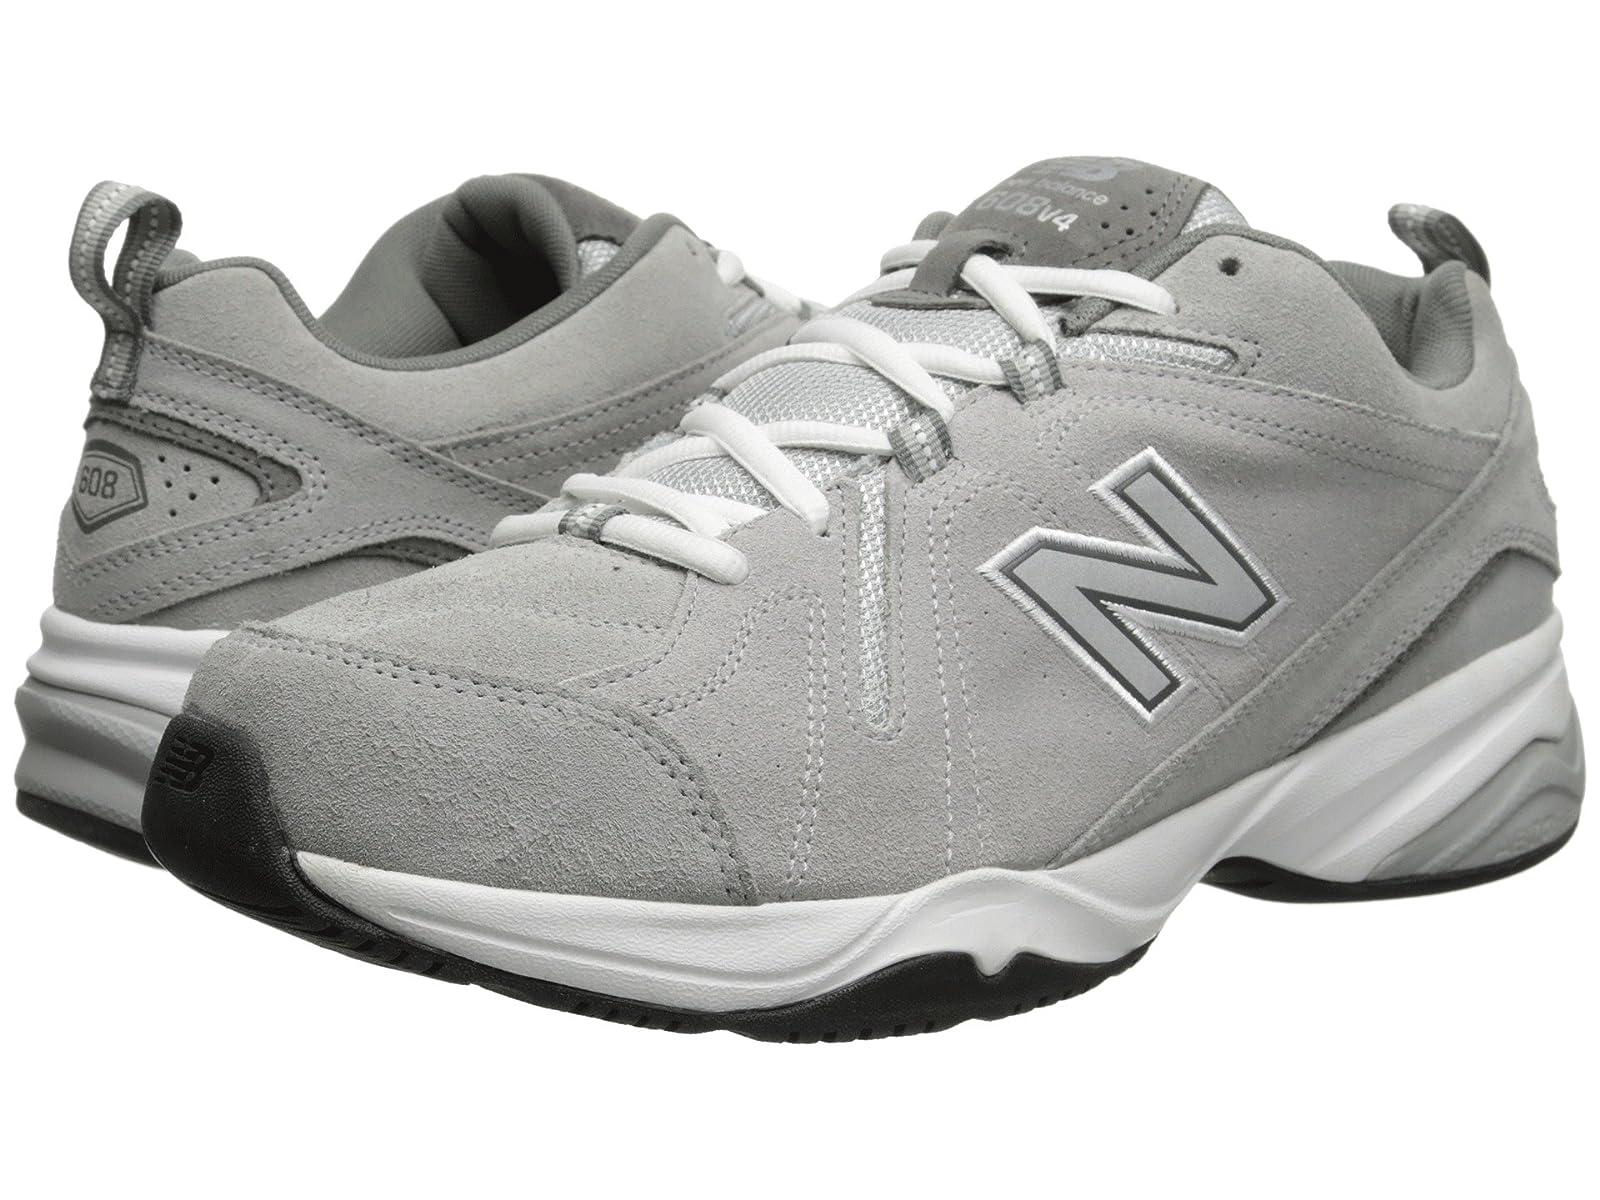 New Balance MX608v4Atmospheric grades have affordable shoes